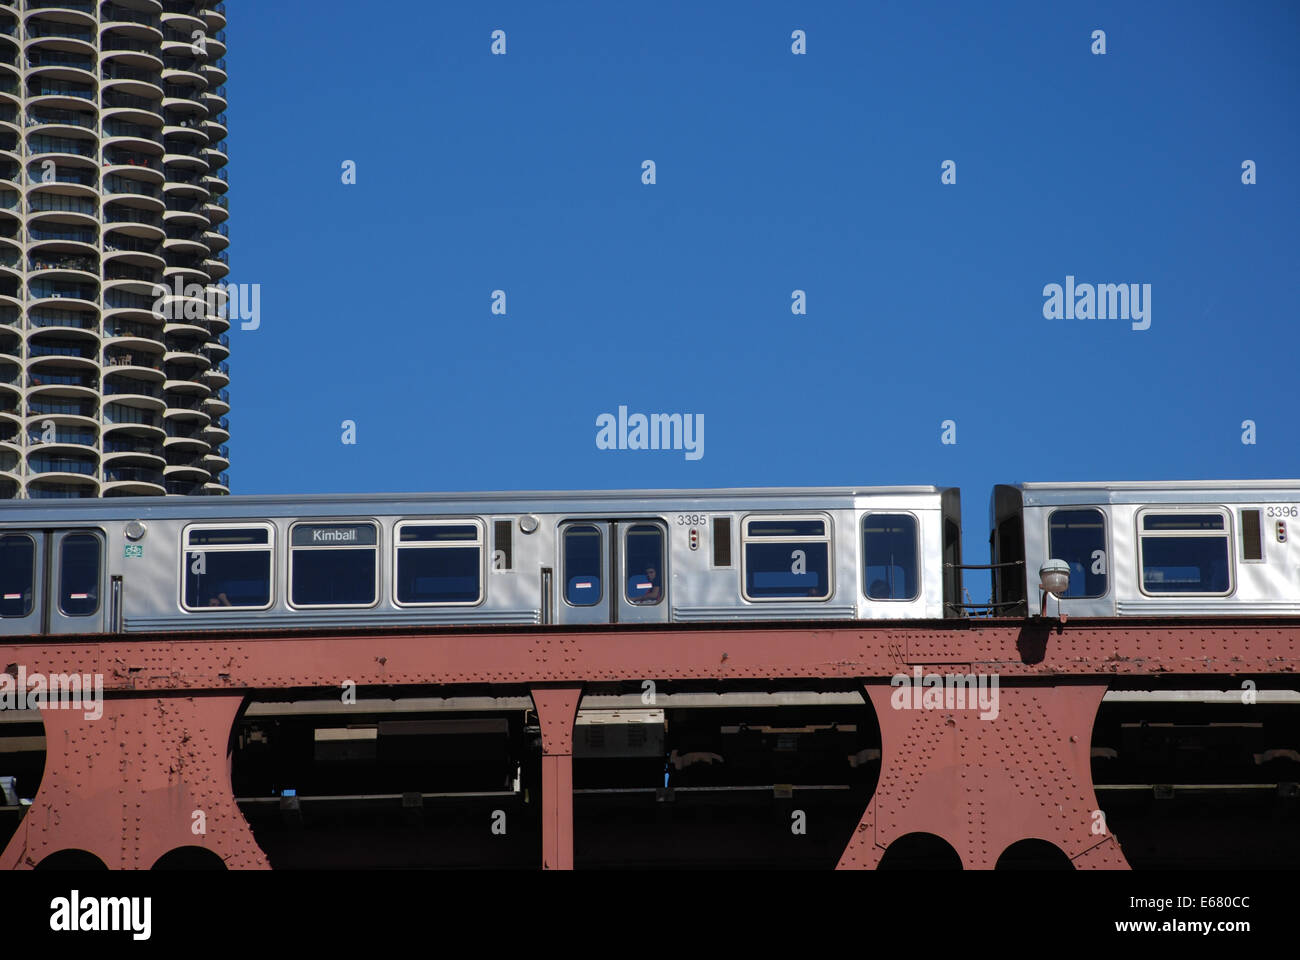 L Train Stock Photos & L Train Stock Images - Alamy